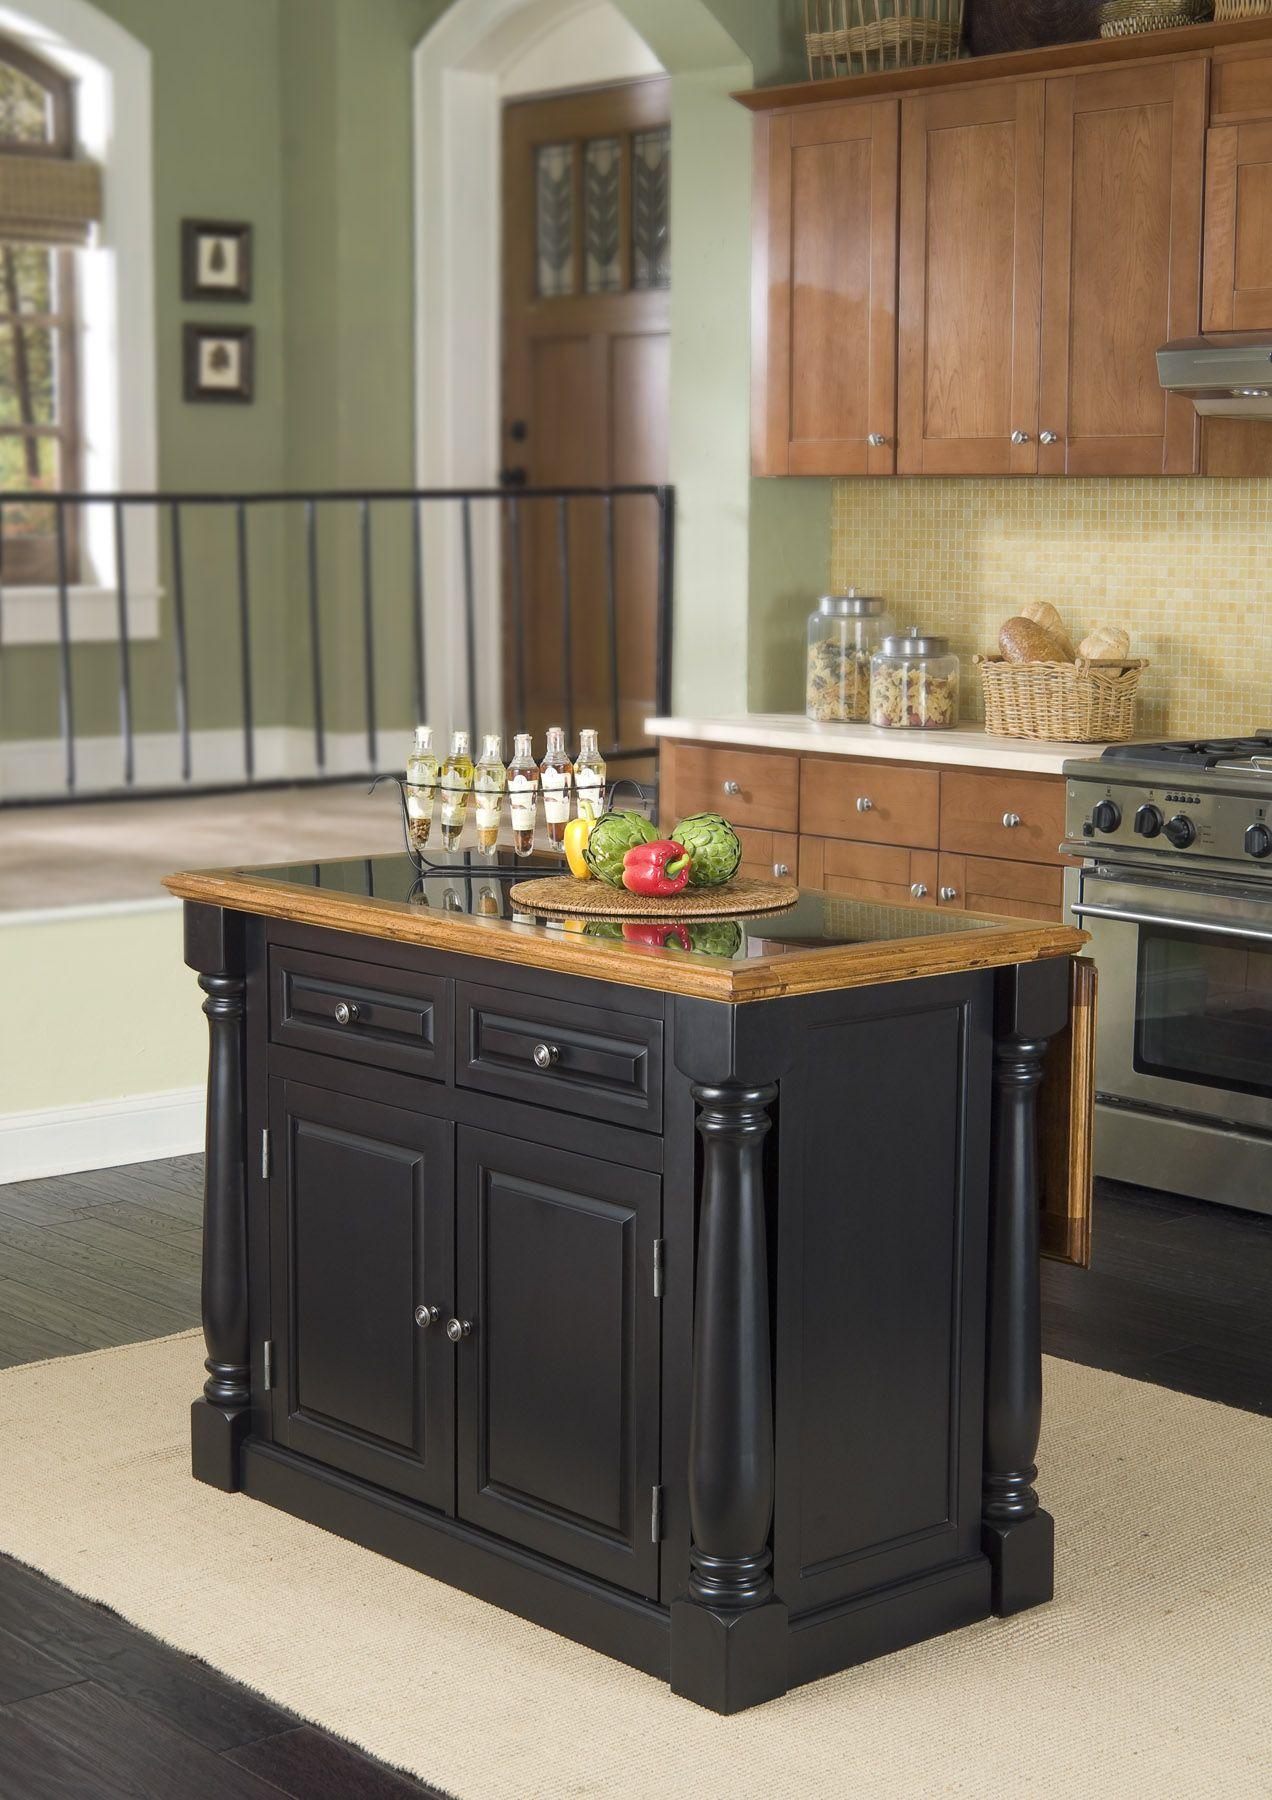 p P granite kitchen island Home Styles Monarch Hidden Leg Kitchen Island with Granite Top Home Furniture Dining Kitchen Furniture Kitchen Carts Islands